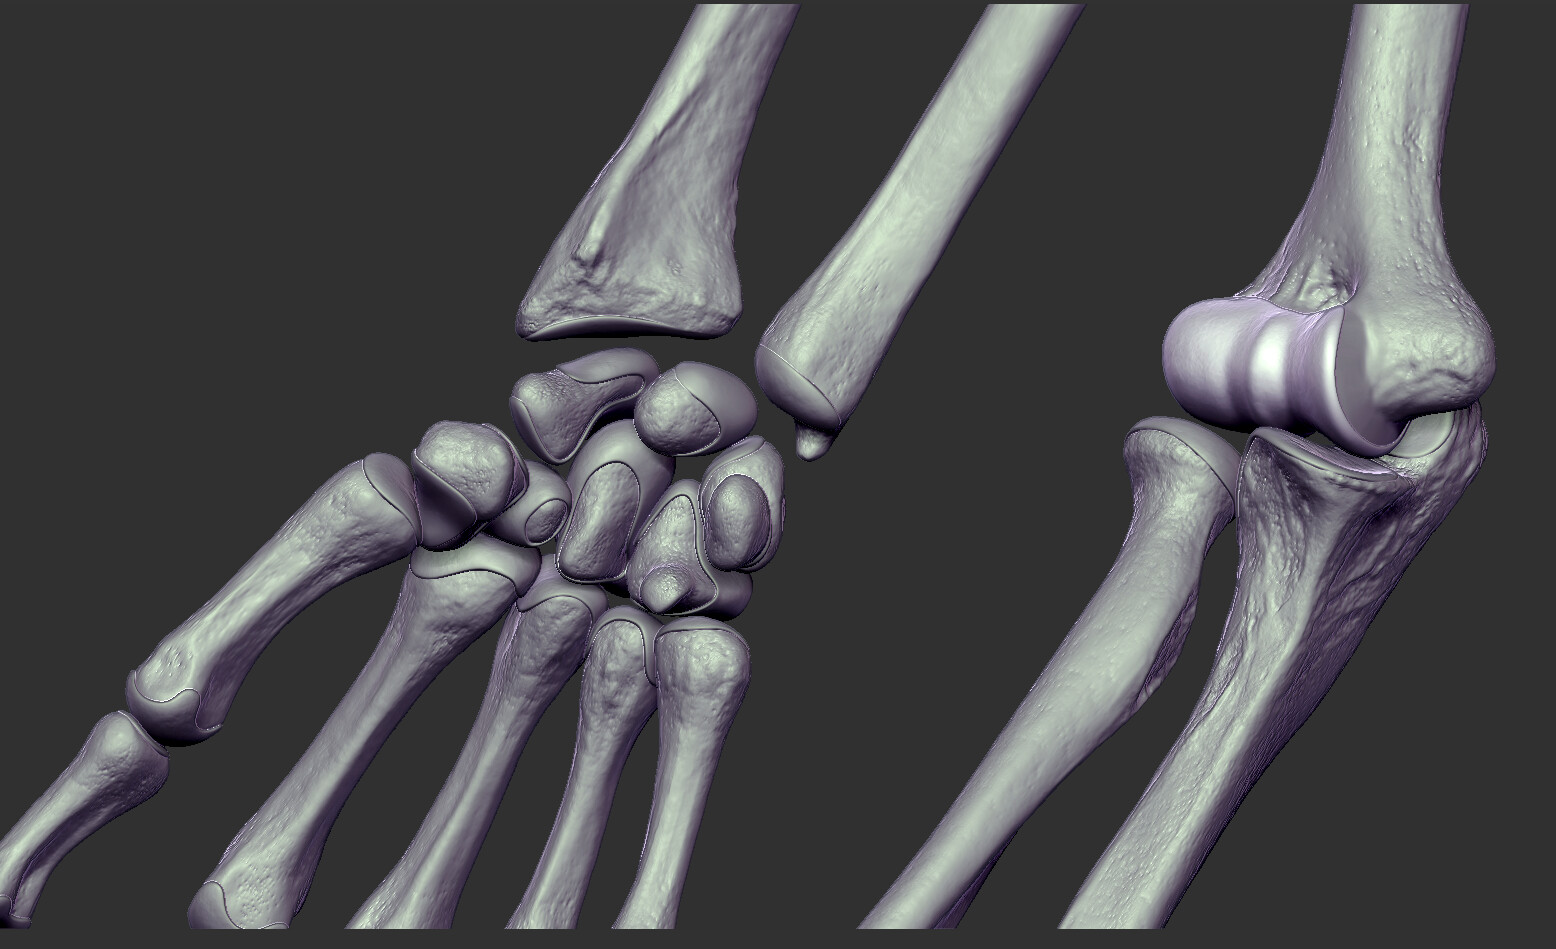 Andrey gritsuk hand 2s